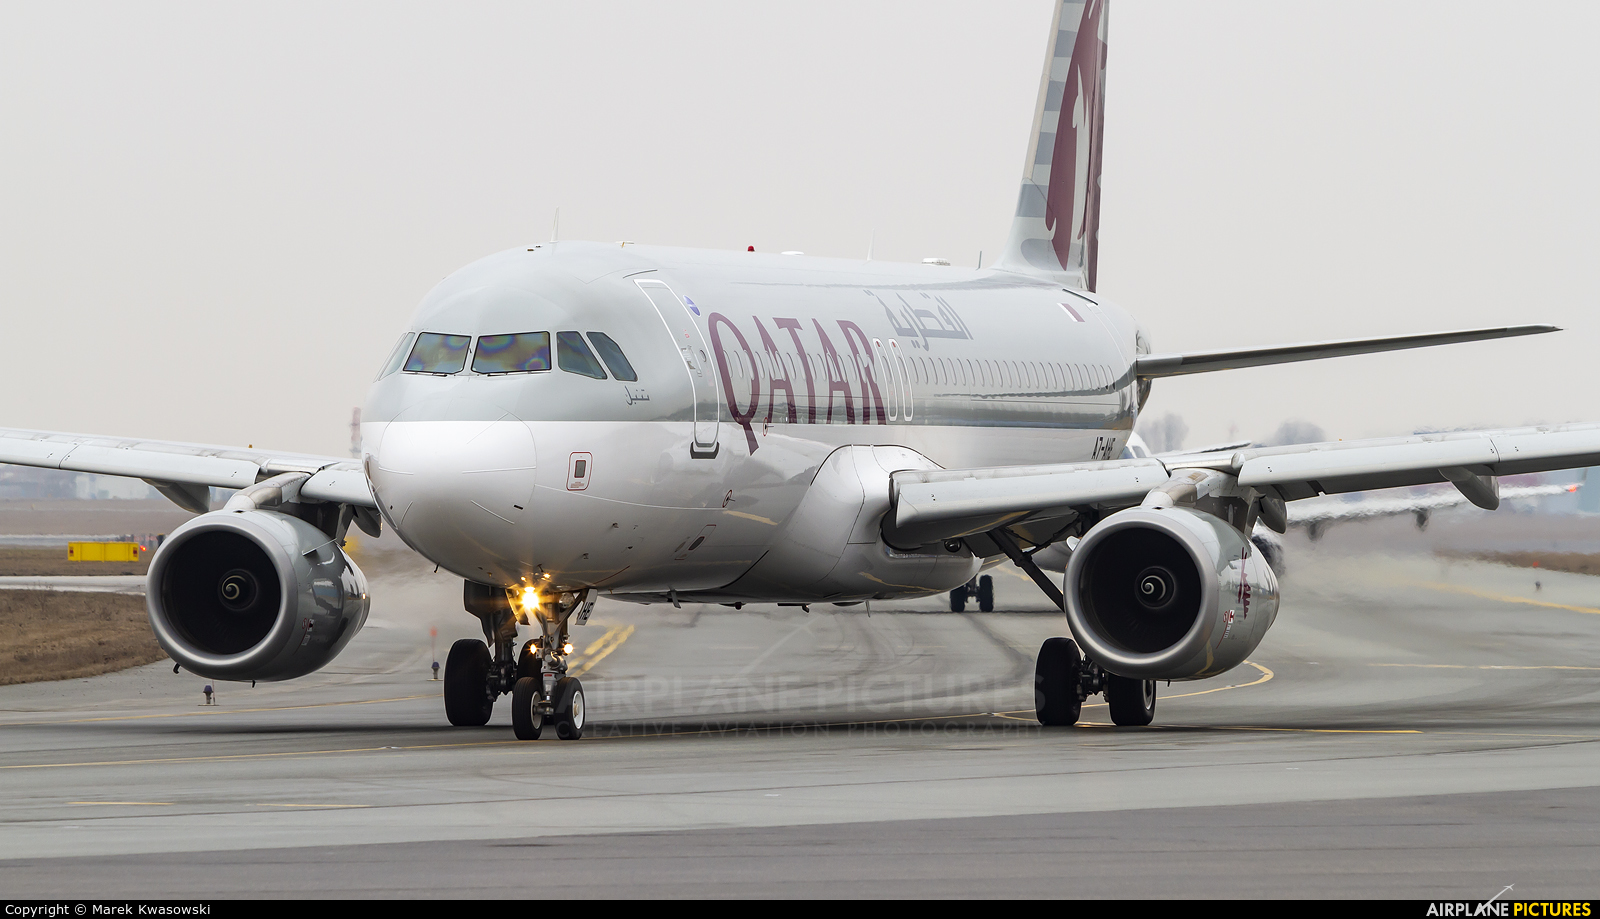 Qatar Airways A7-AHE aircraft at Warsaw - Frederic Chopin